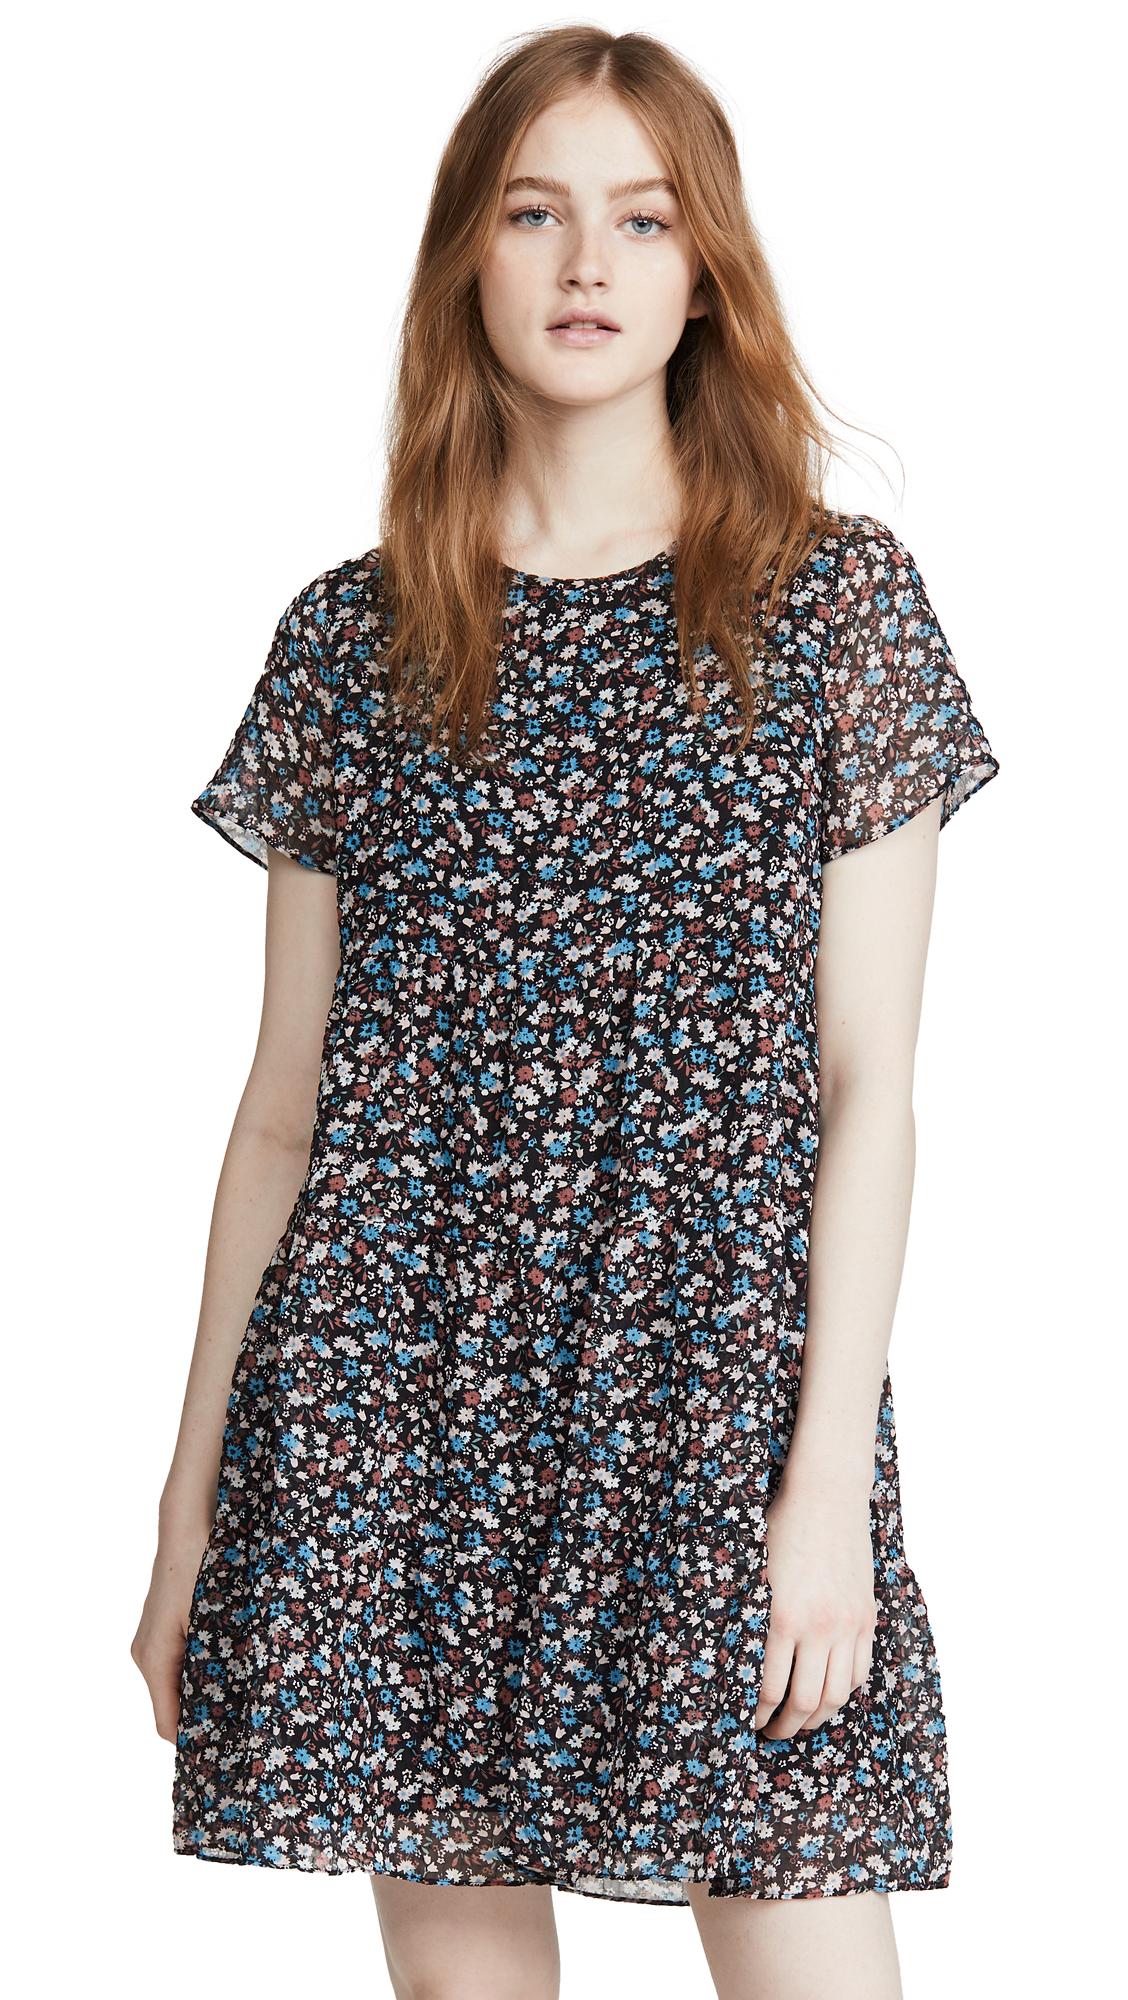 Madewell Tiered Mini Dress - 50% Off Sale